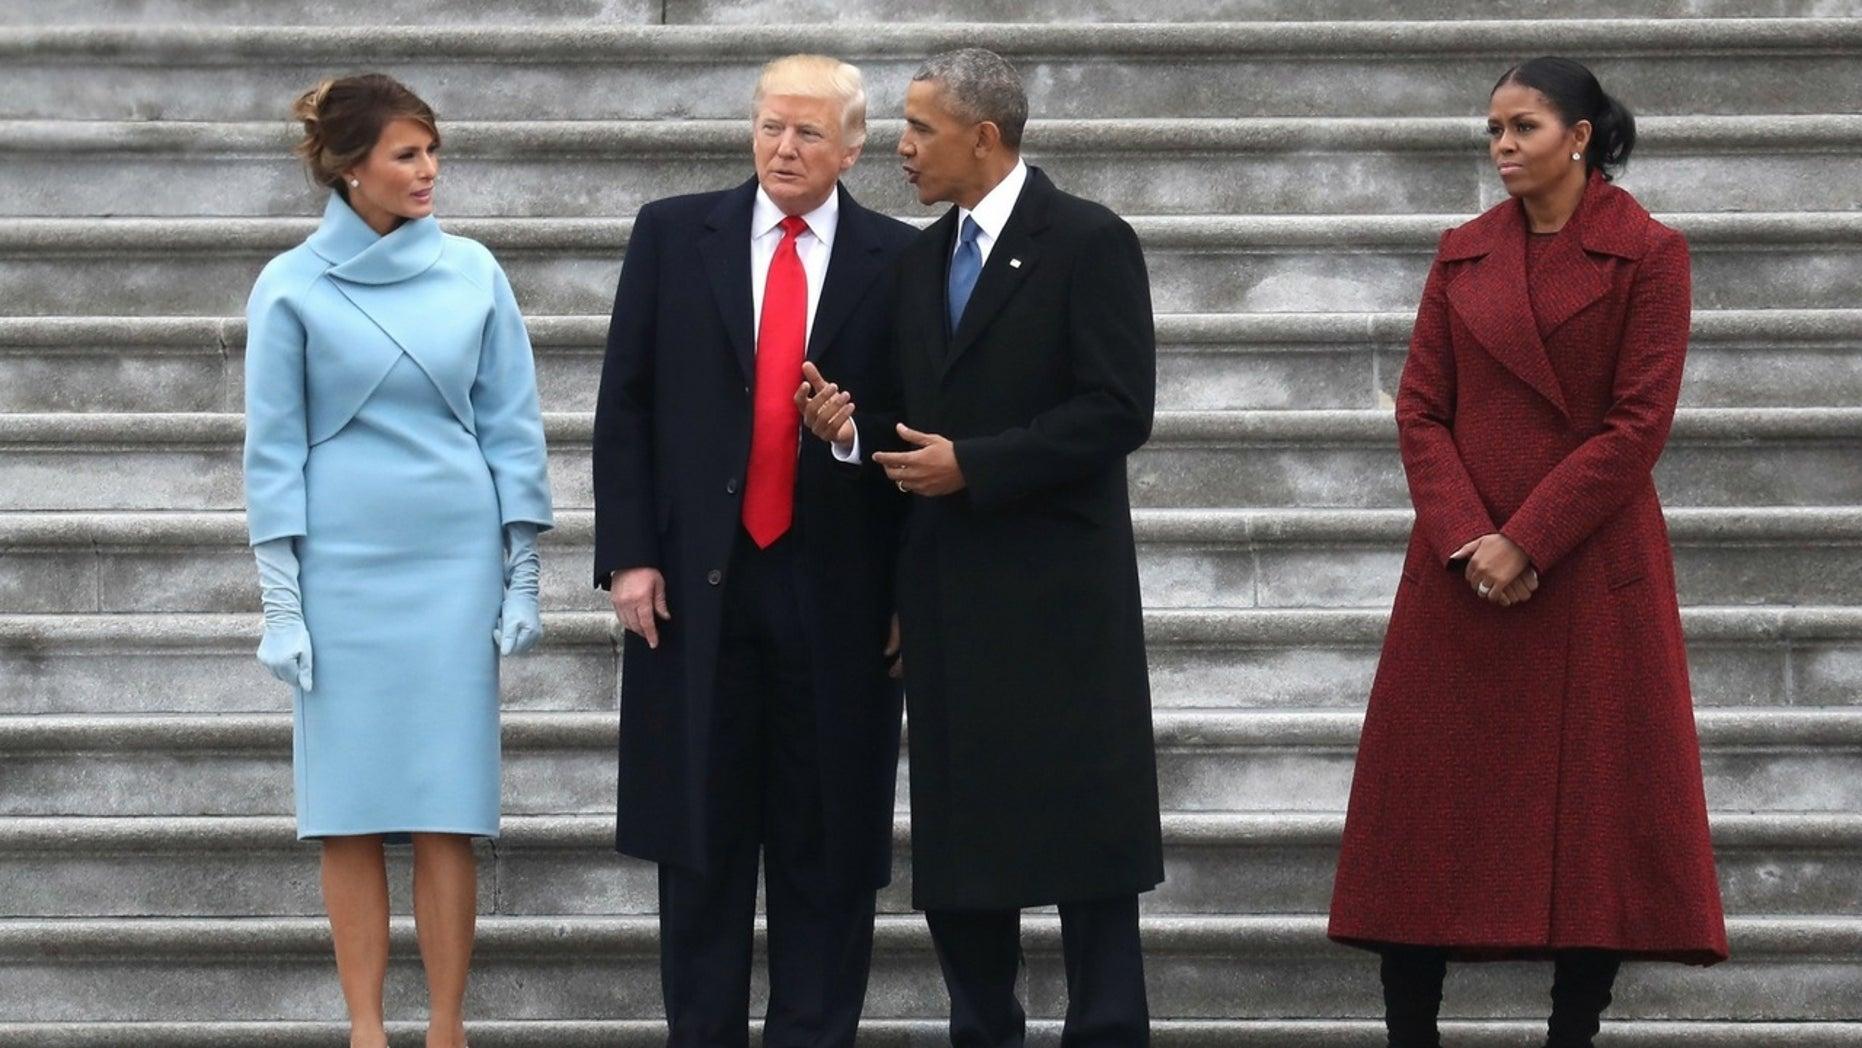 Melania Trump follows former President Barack Obama on her first lady Twitter handle.